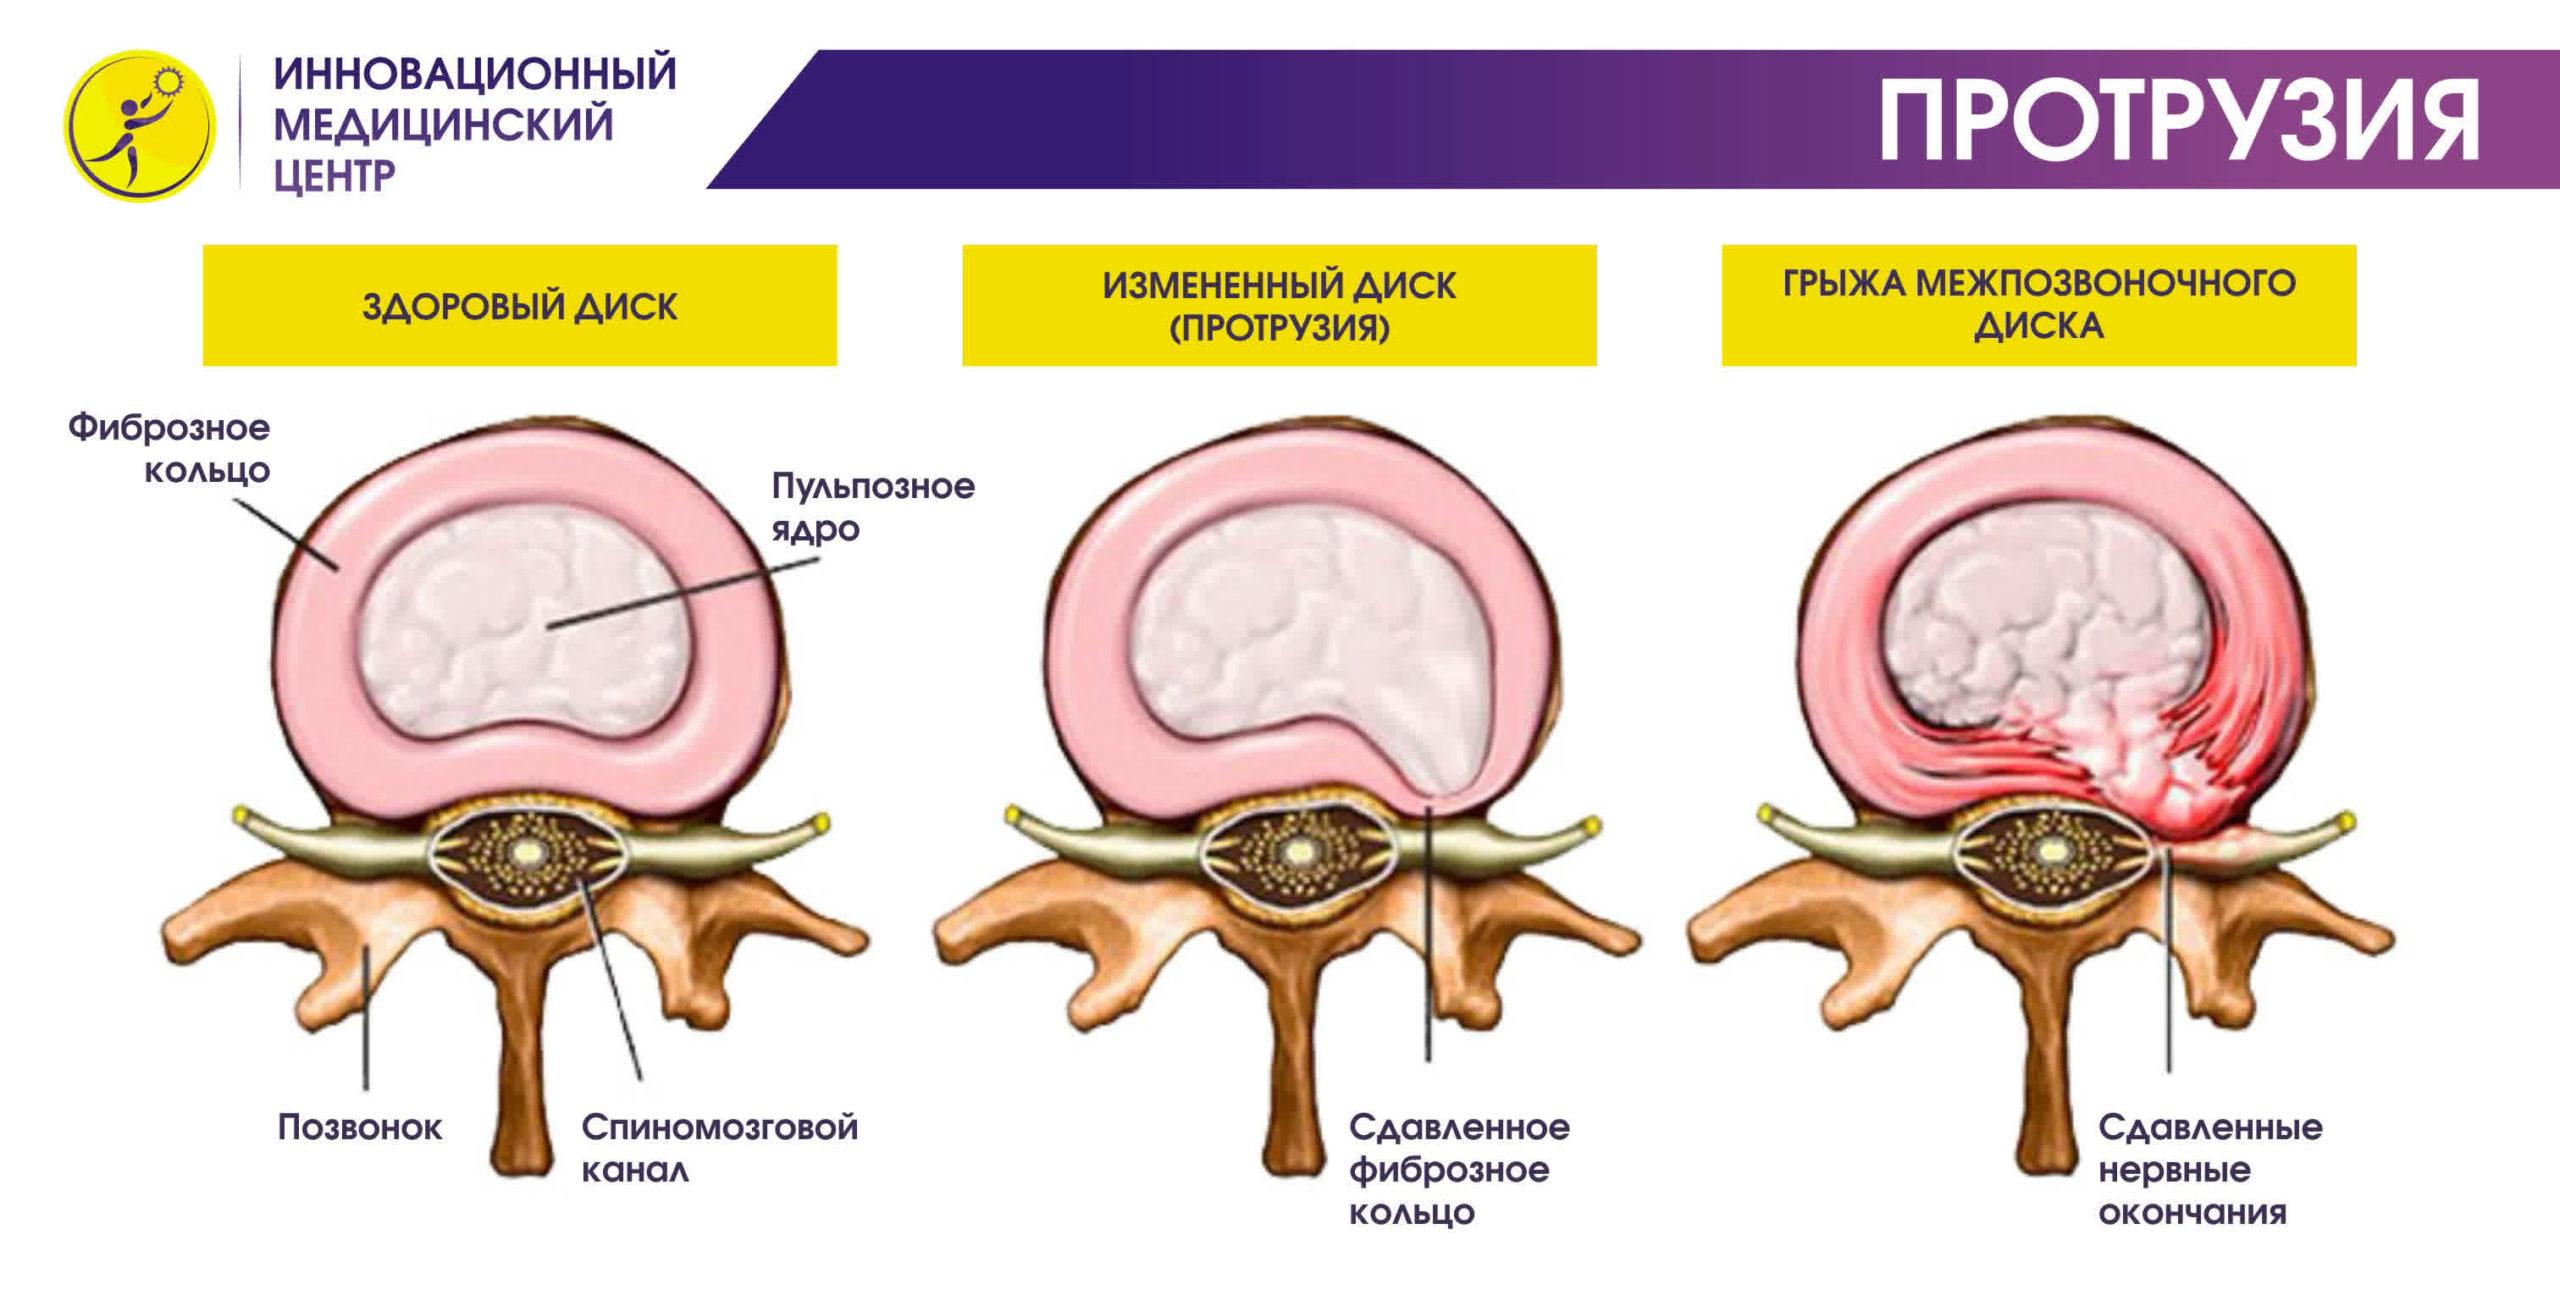 osnovnye simptomy dorzalnoj protruzii diska